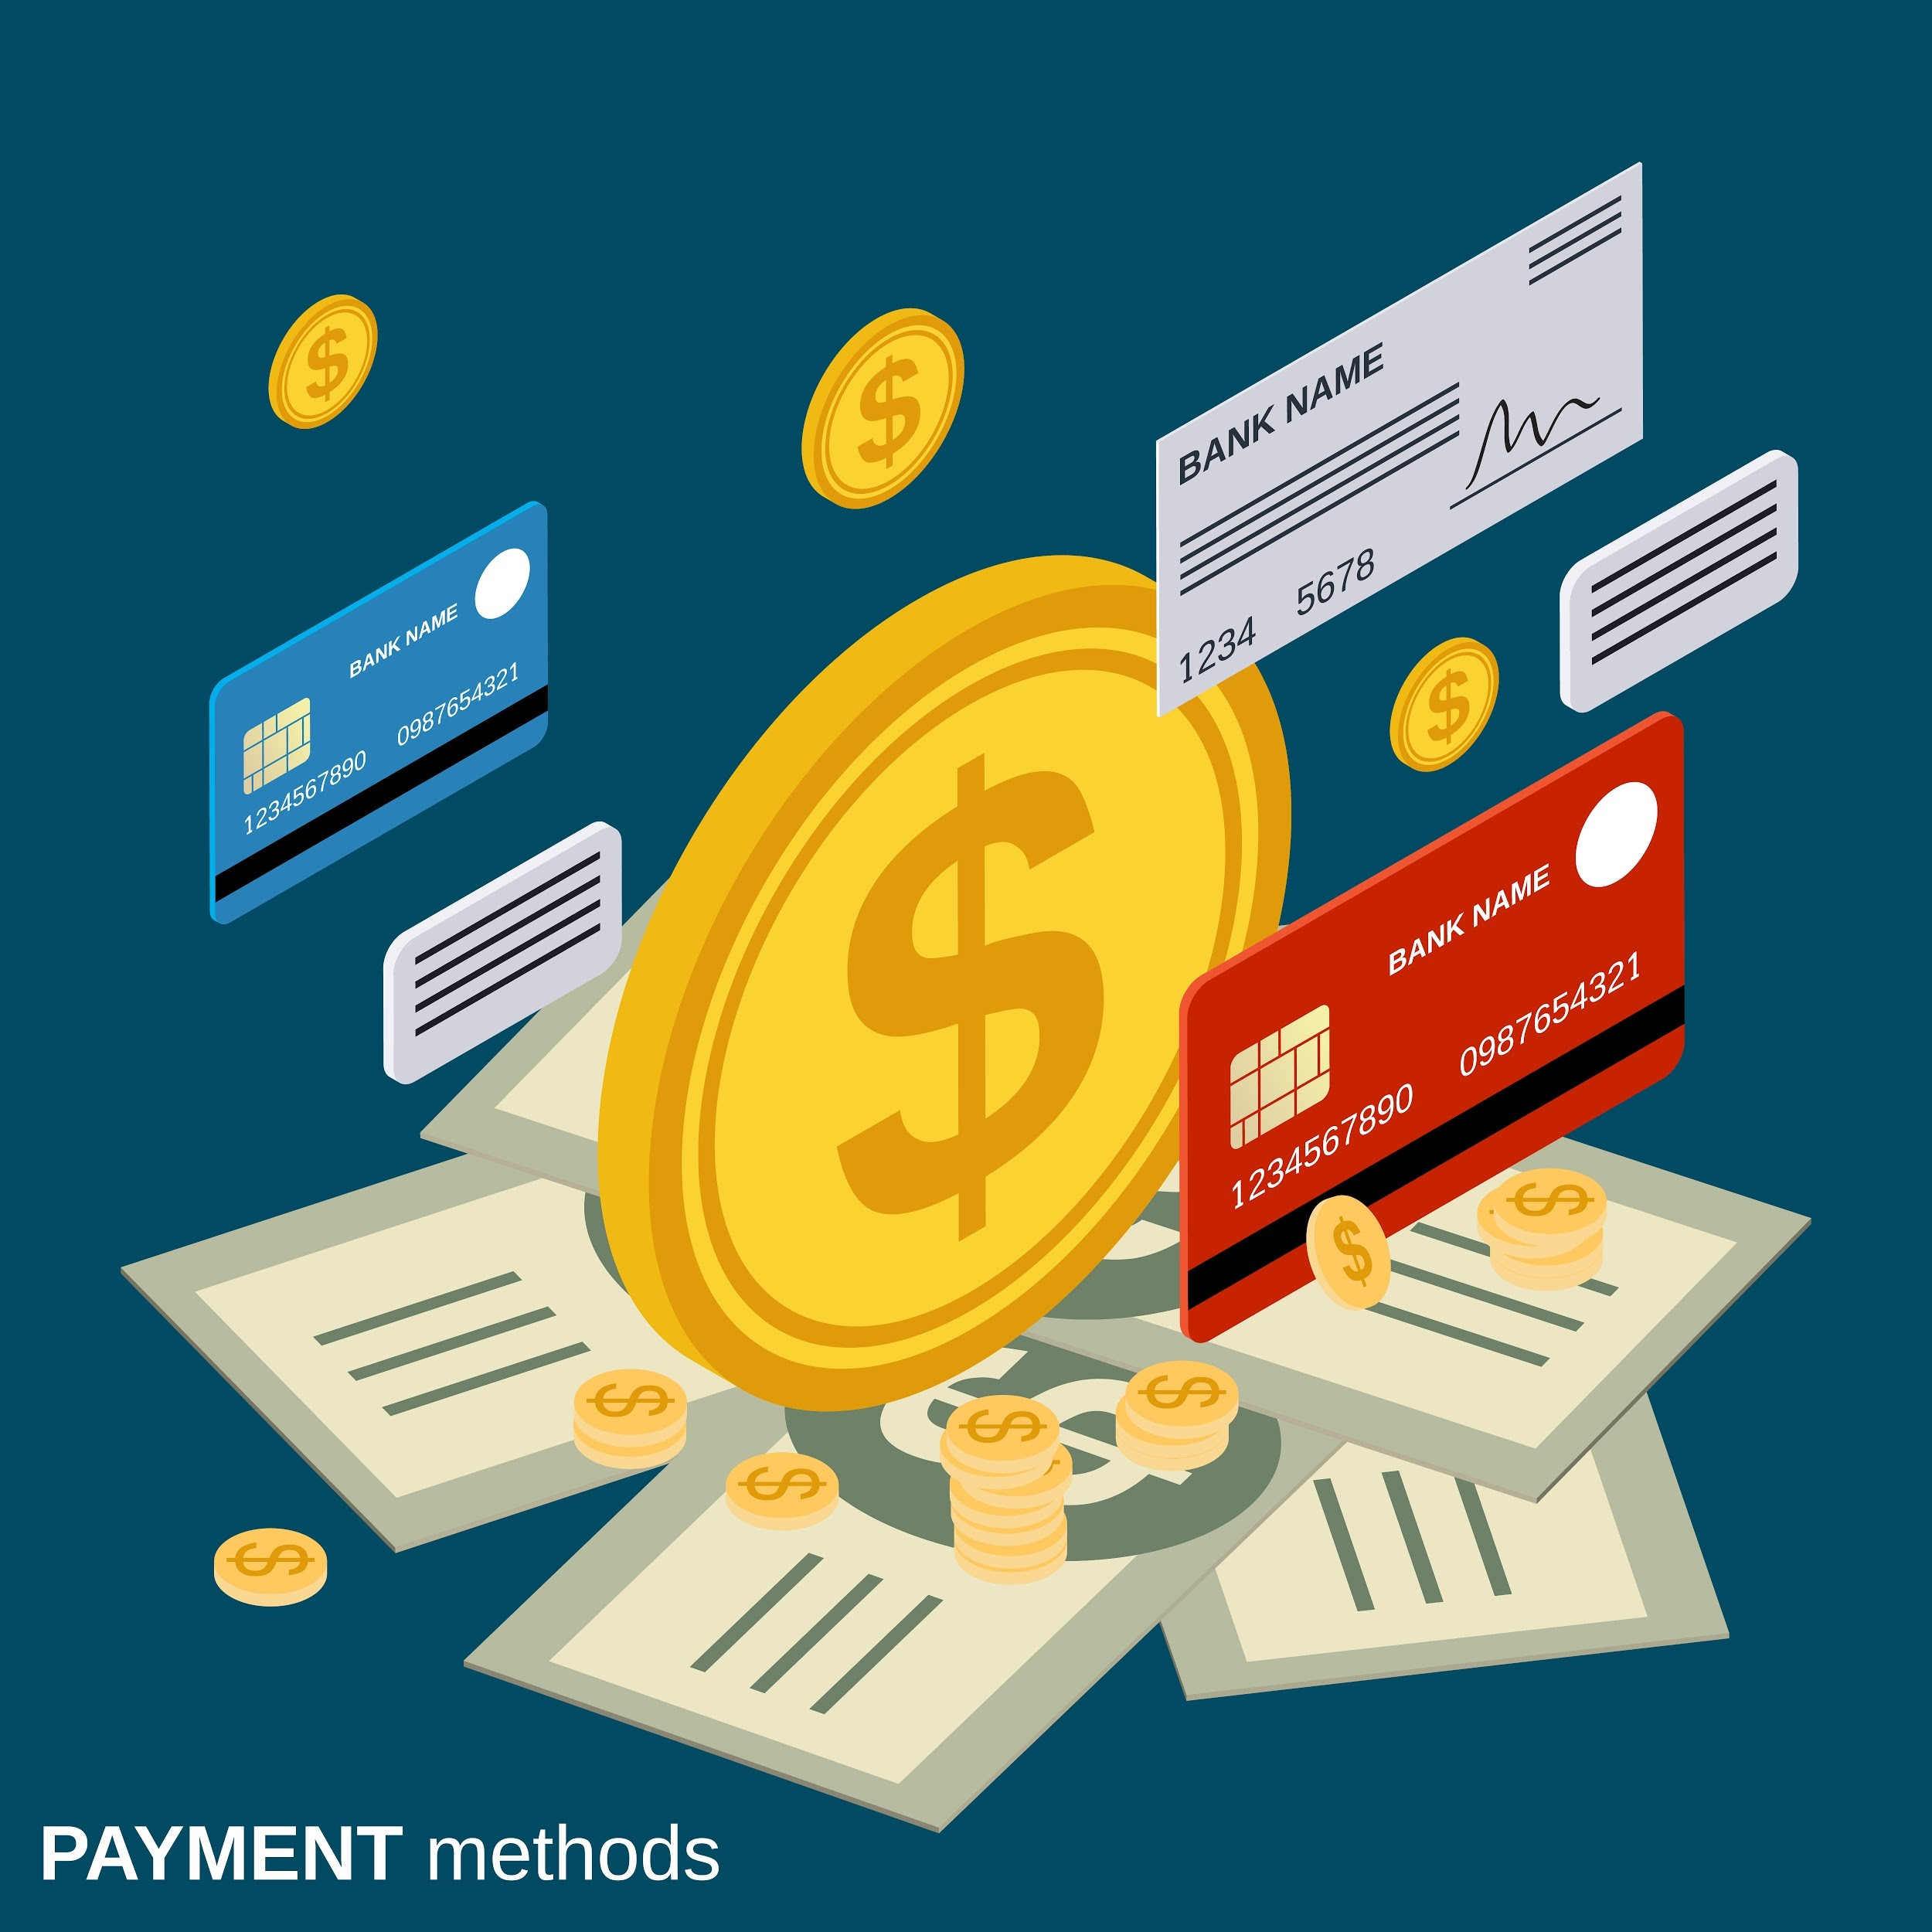 choose bitcoin purchase method